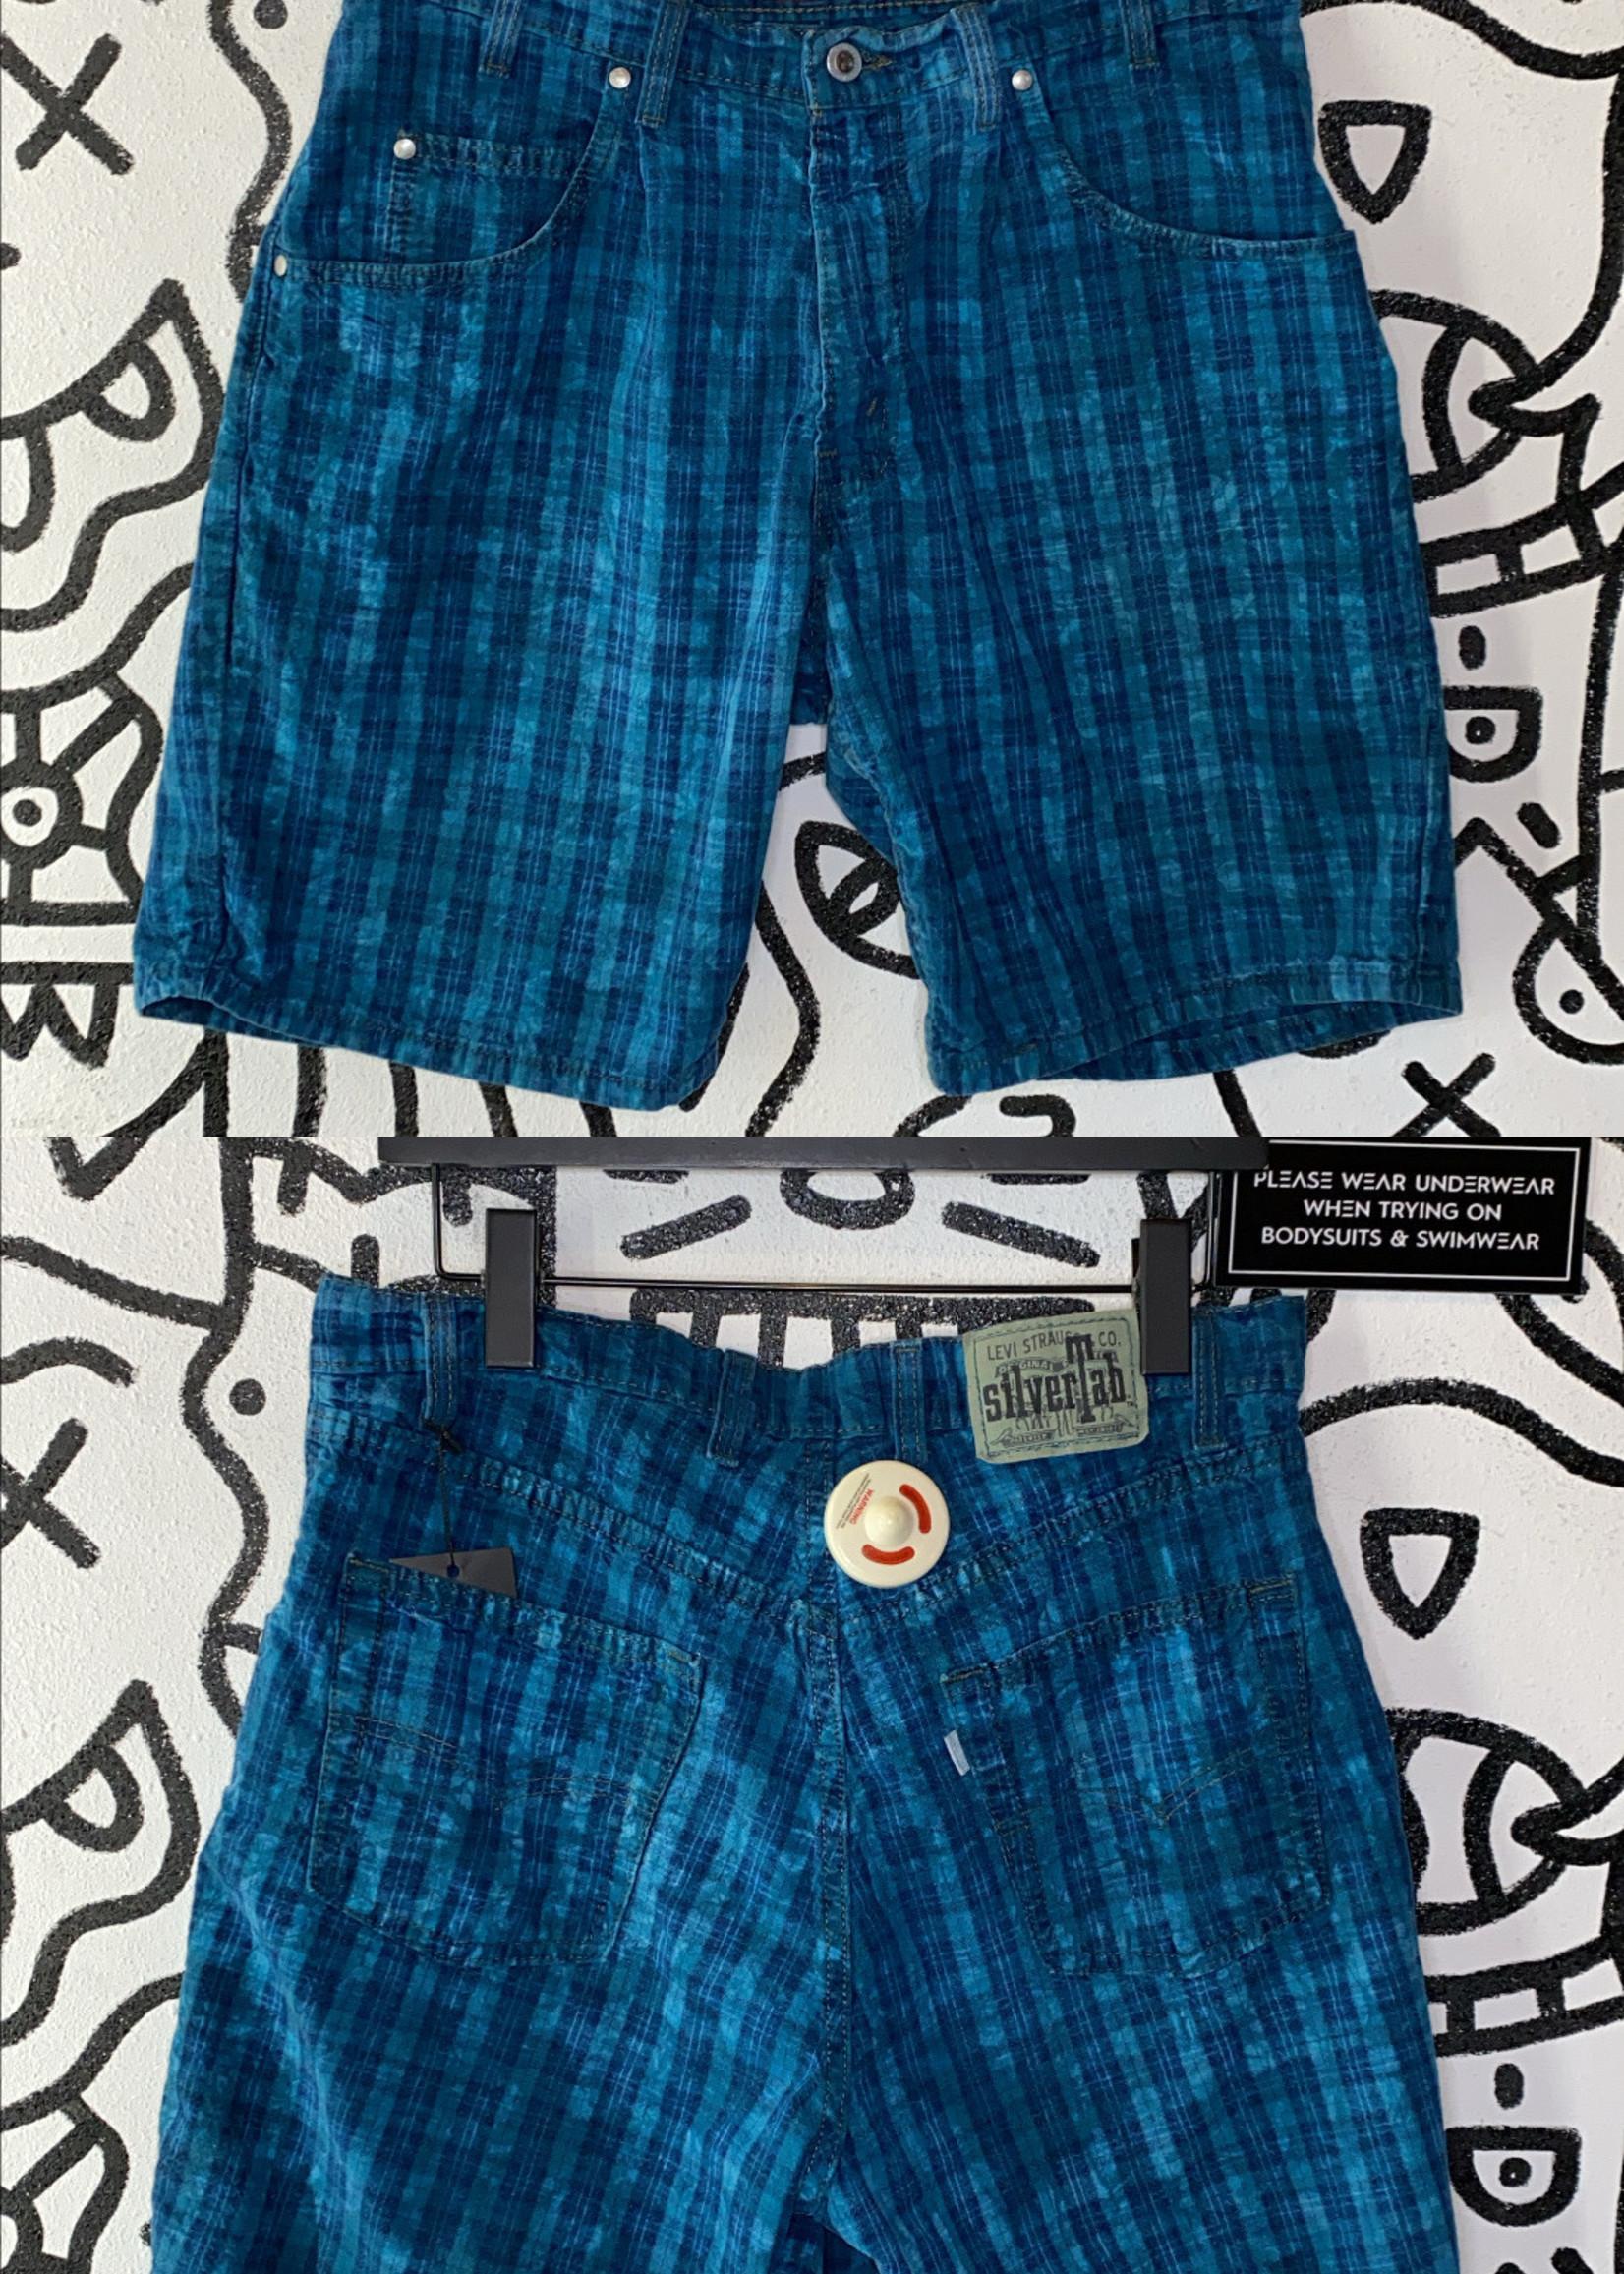 Vintage Levis silver tab teal shorts 33